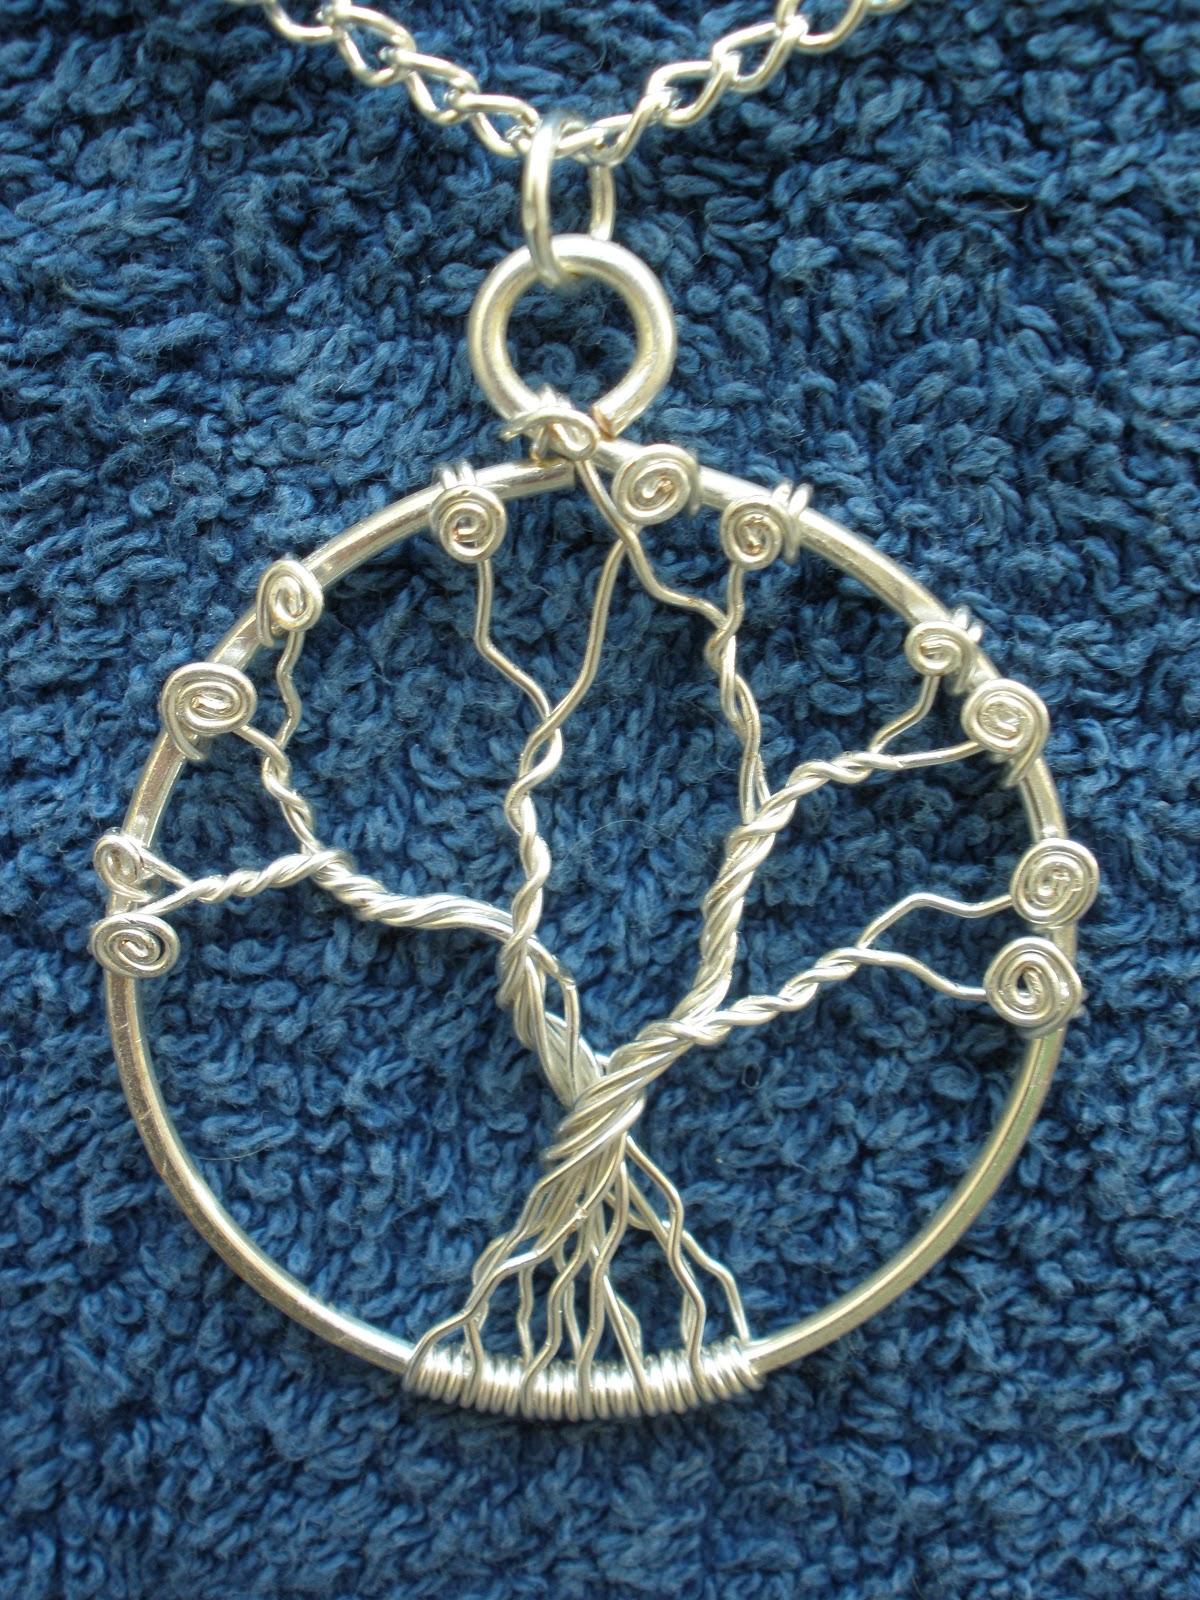 Chloe Louise Handmade Jewellery: How to: Make a Tree of Life Pendant